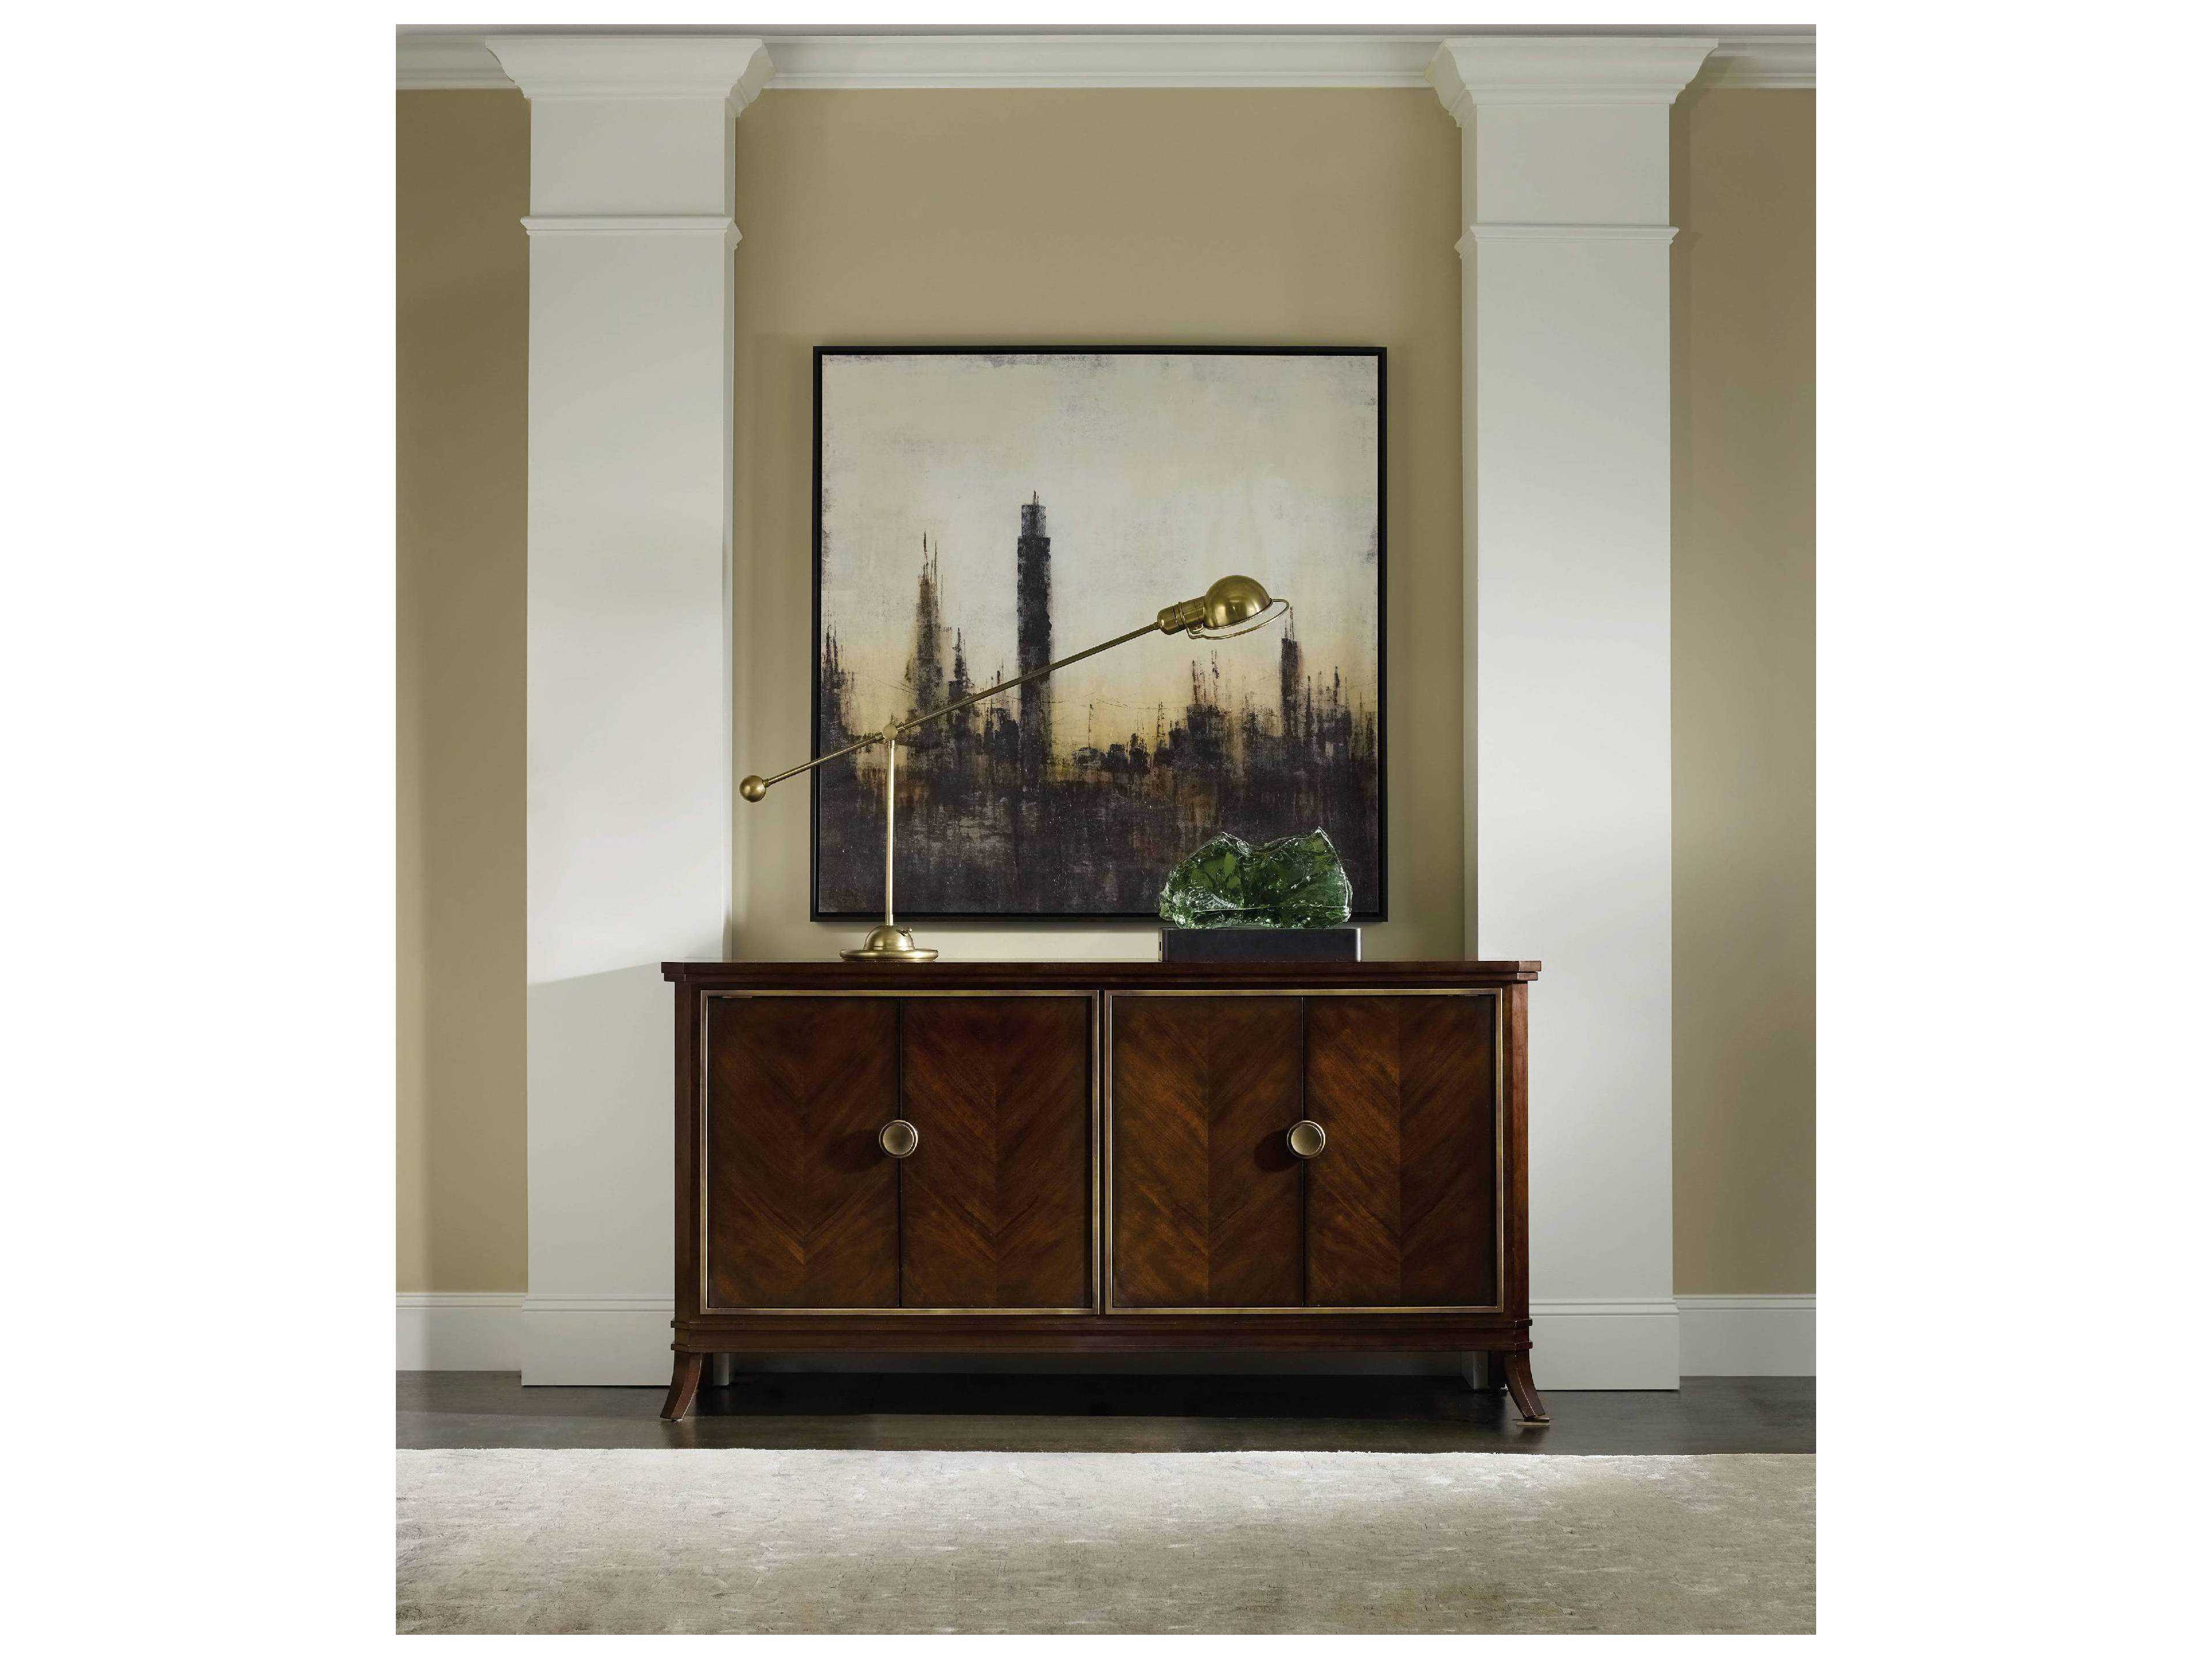 Hooker Furniture Palisade Dark Wood 68''lx 18''w Buffet Inside Recent Palisade Sideboards (View 6 of 20)